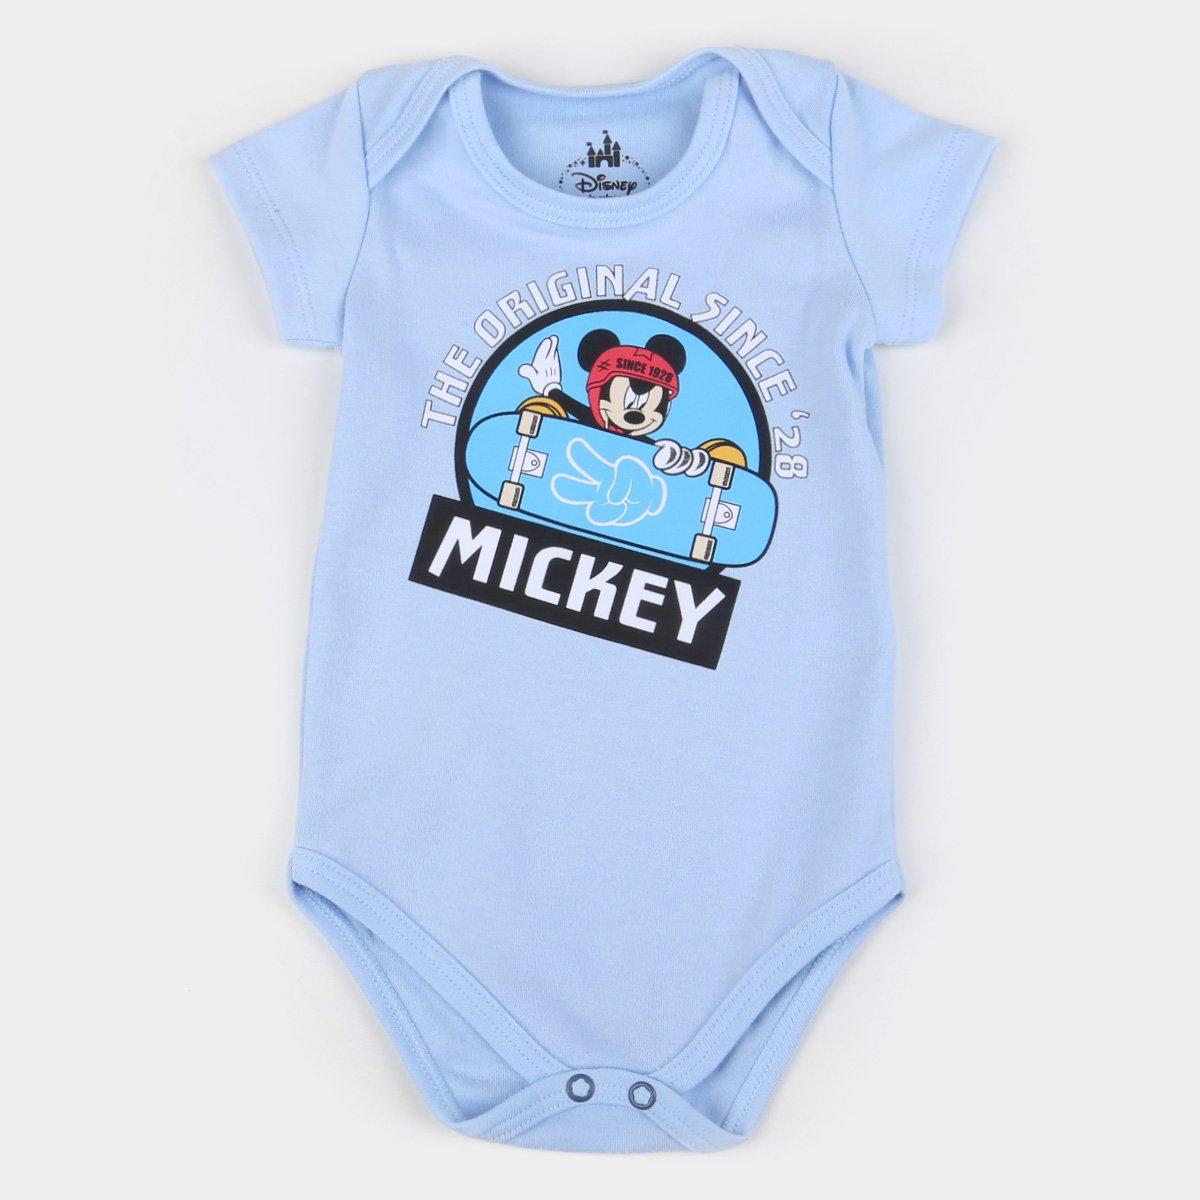 Body Bebê Marlan Suedine Disney Mickey Mouse Manga Curta